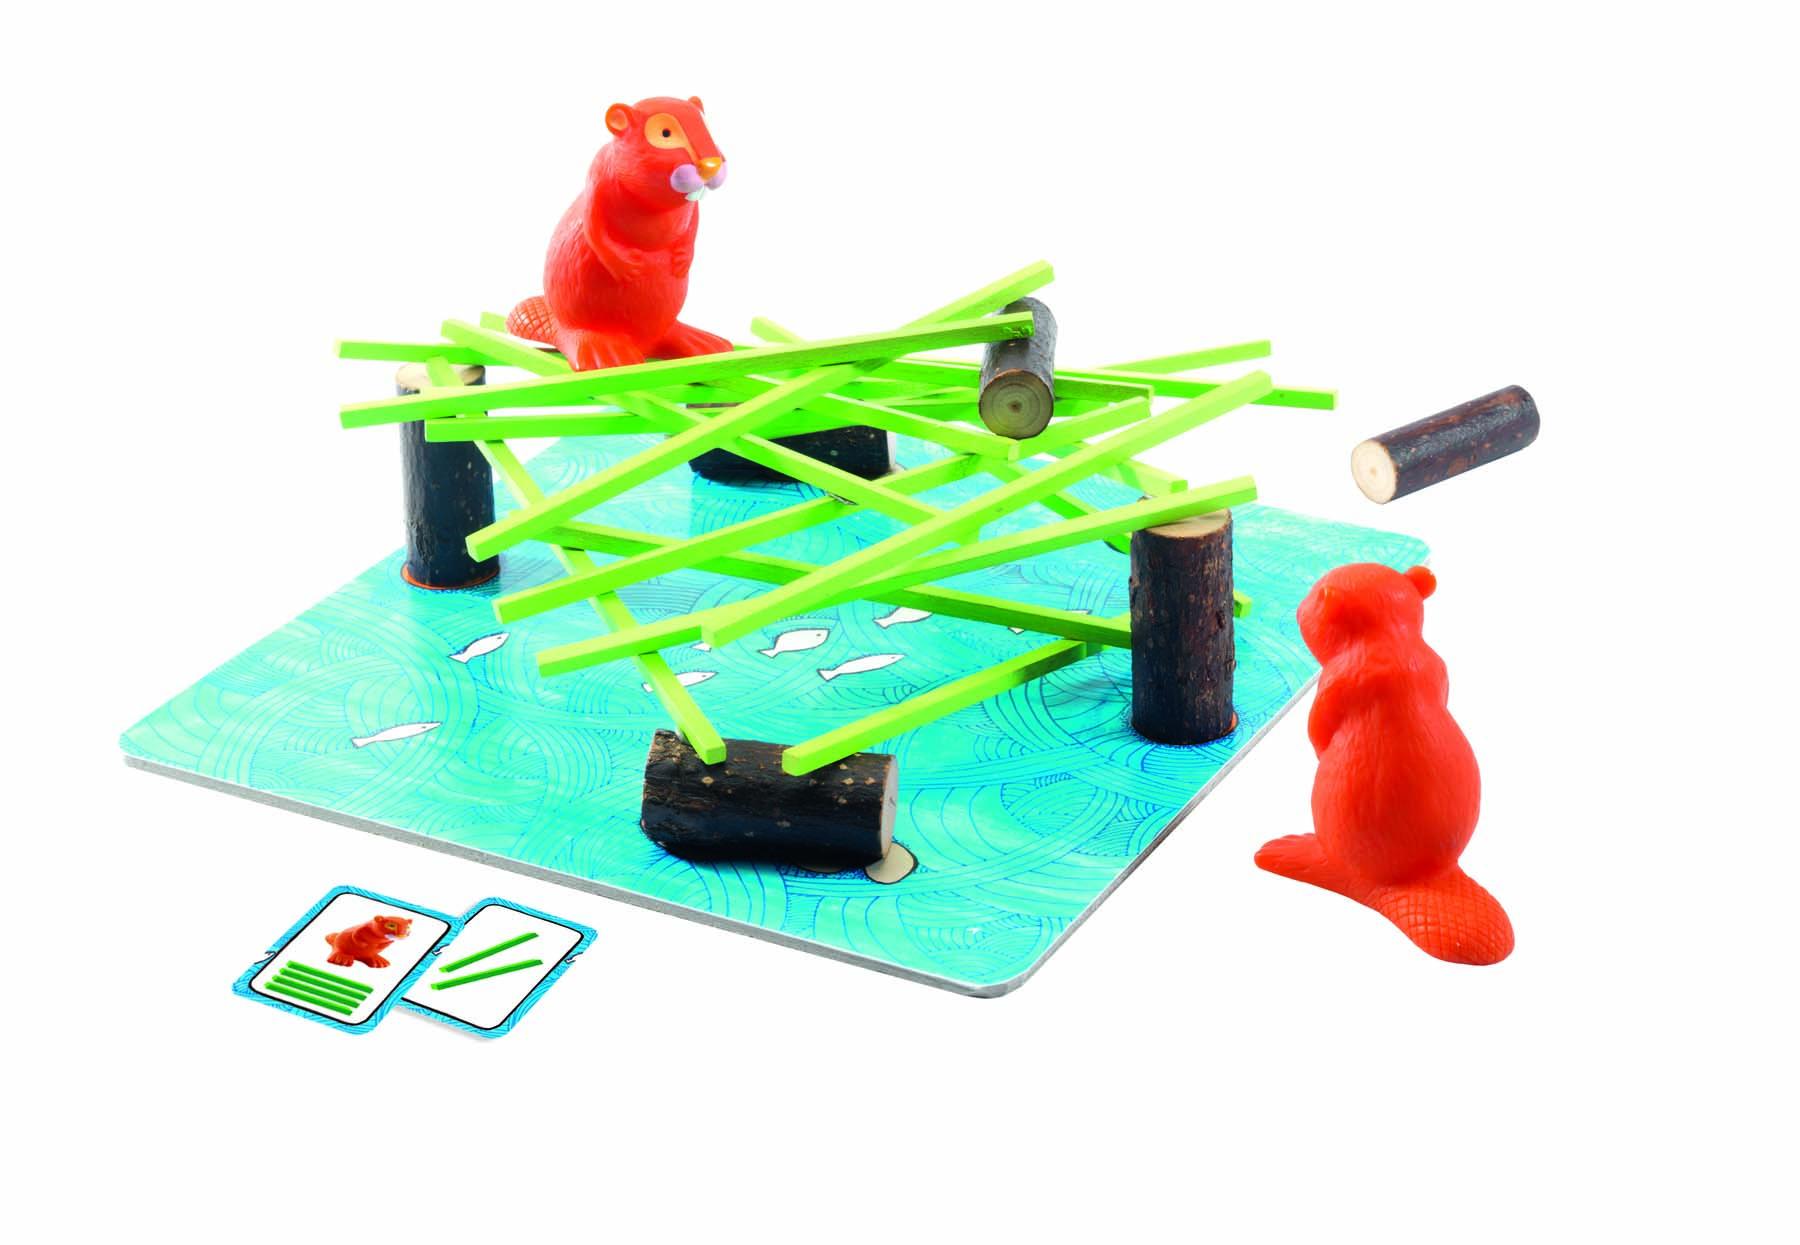 Jocul castorilor priceputi tombalo djeco - 1